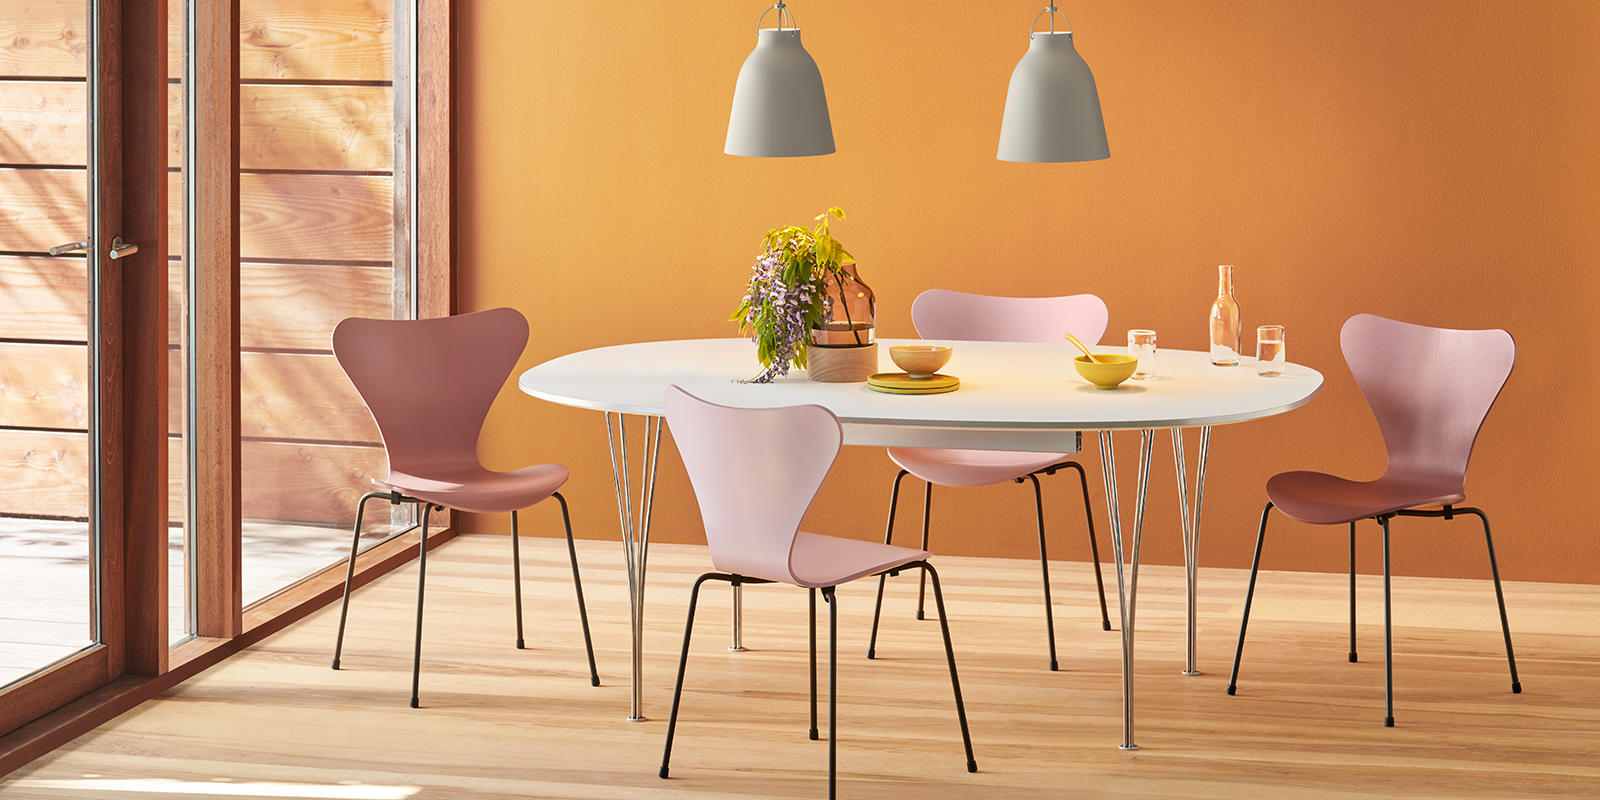 Papillon Interiors Black Friday 2020 - Fritz Hansen Series 7 Chairs & Analog Dining Table